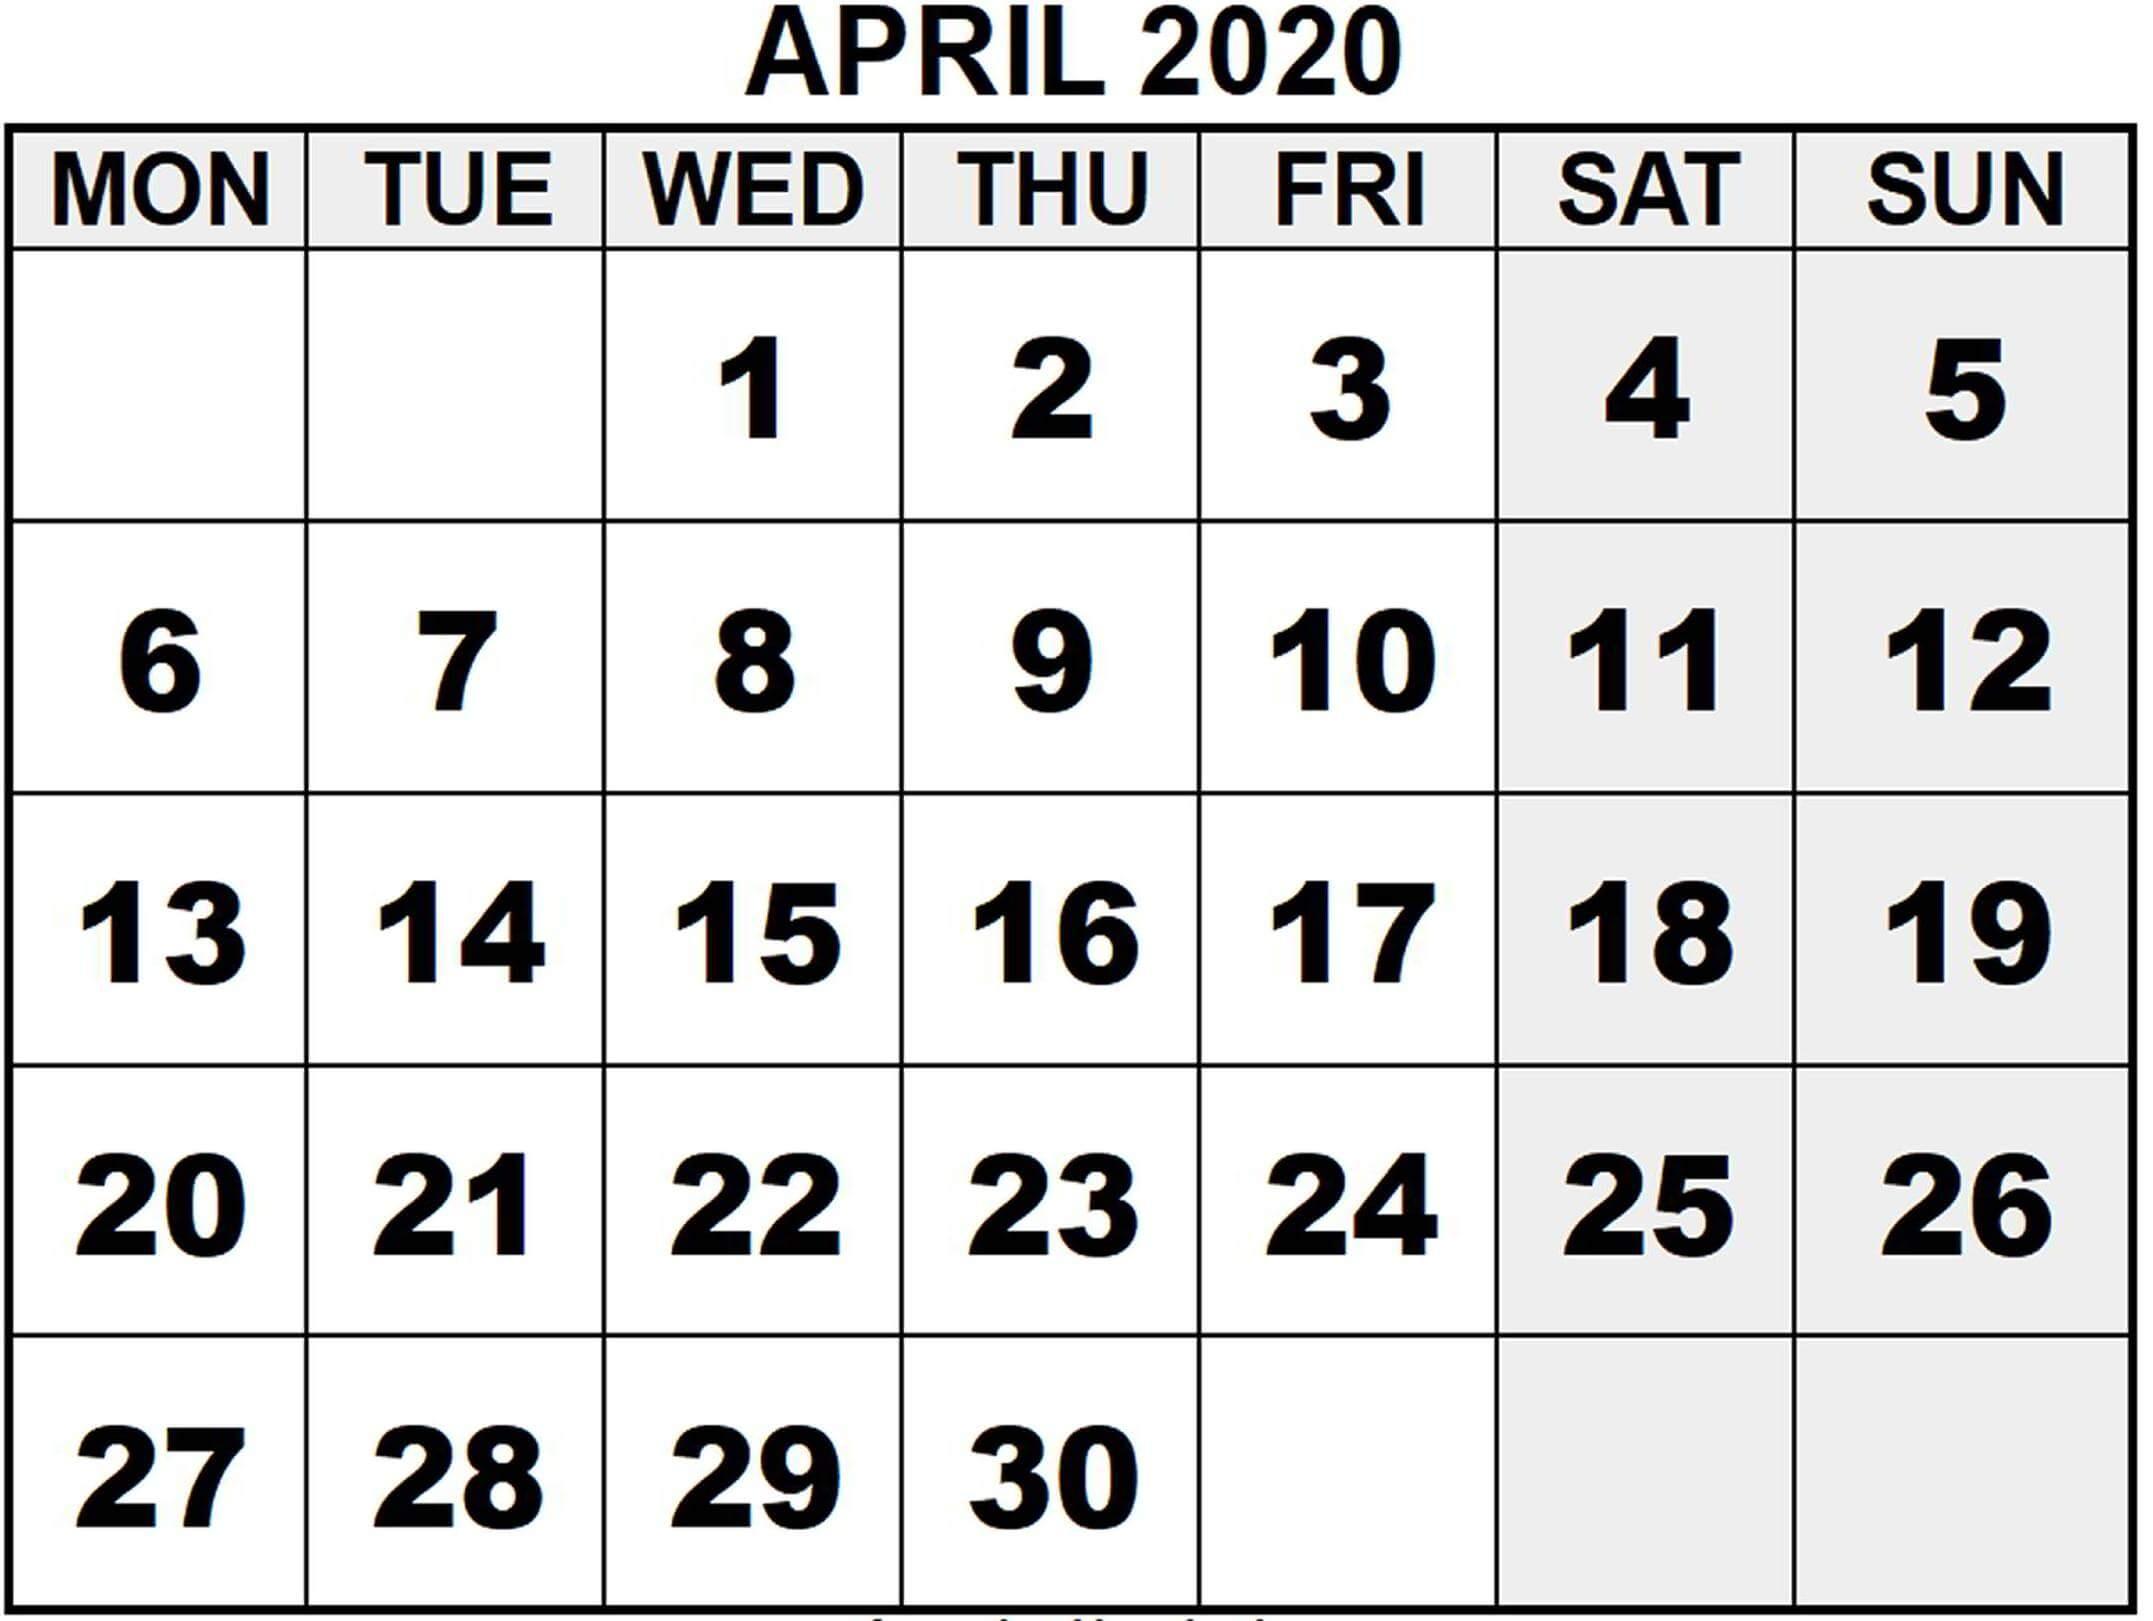 April 2020 Printable Calendar Template With Holidays - Web inside Large Number Calendar